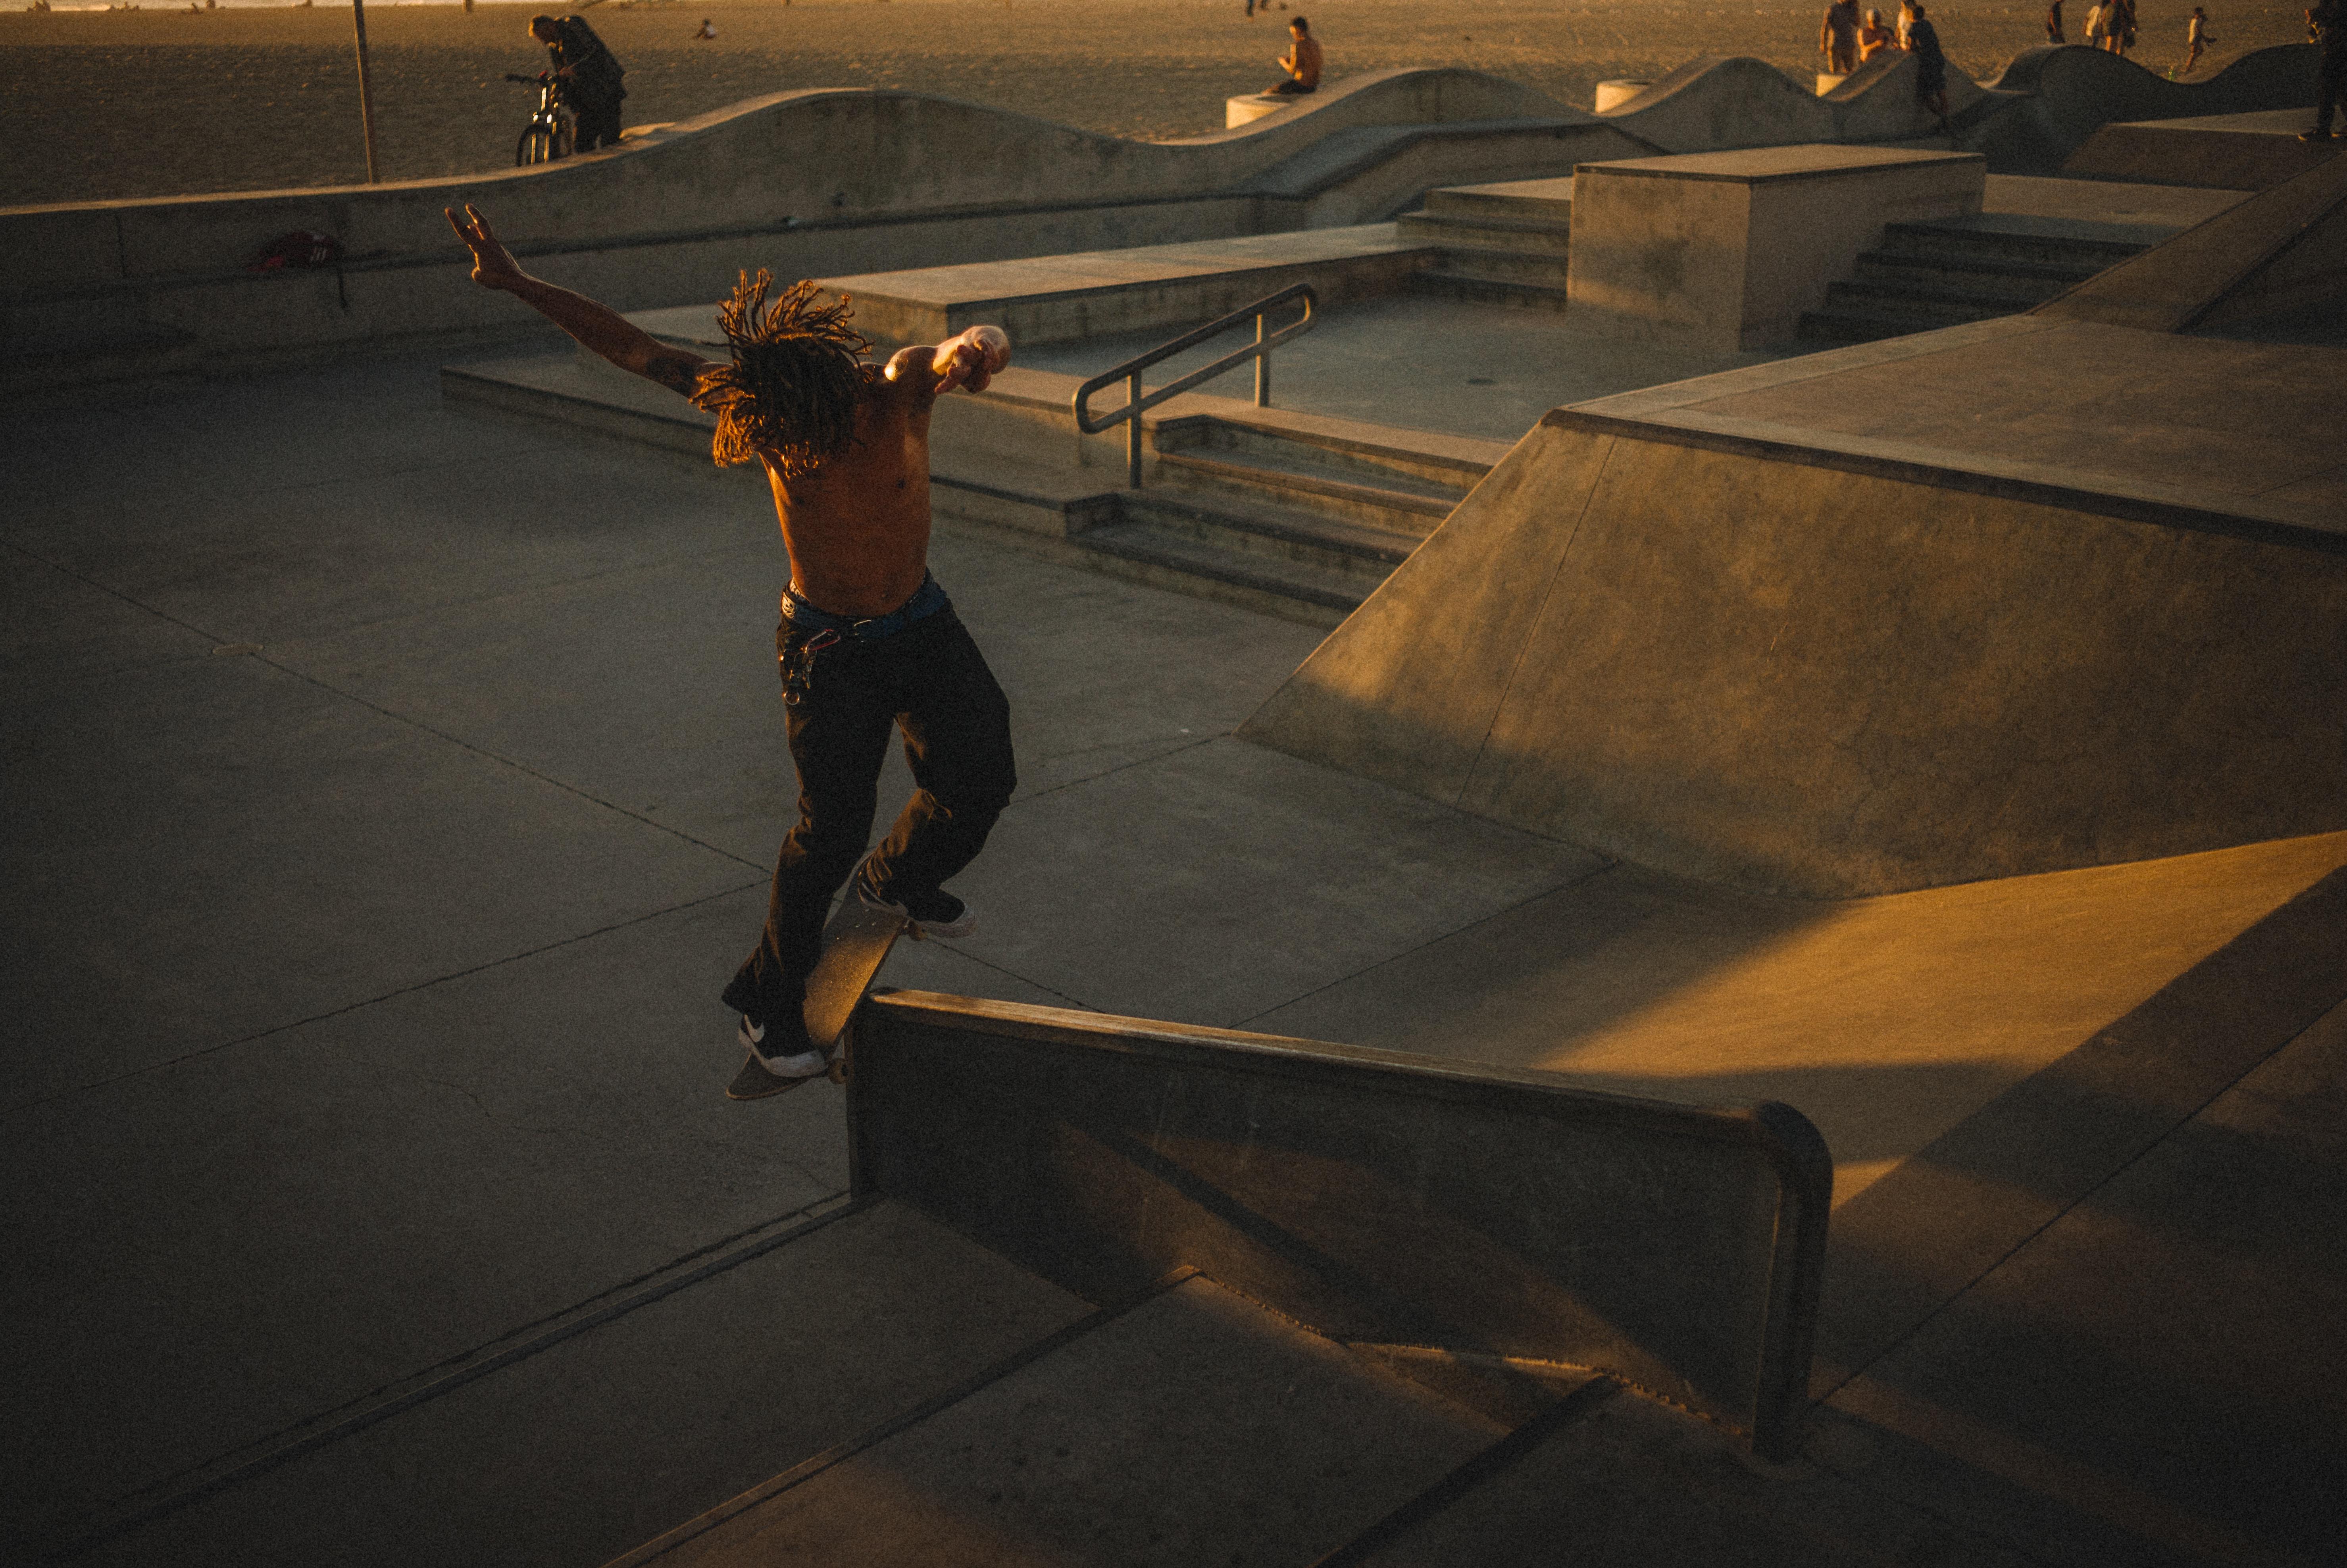 topless man doing skateboard tricks